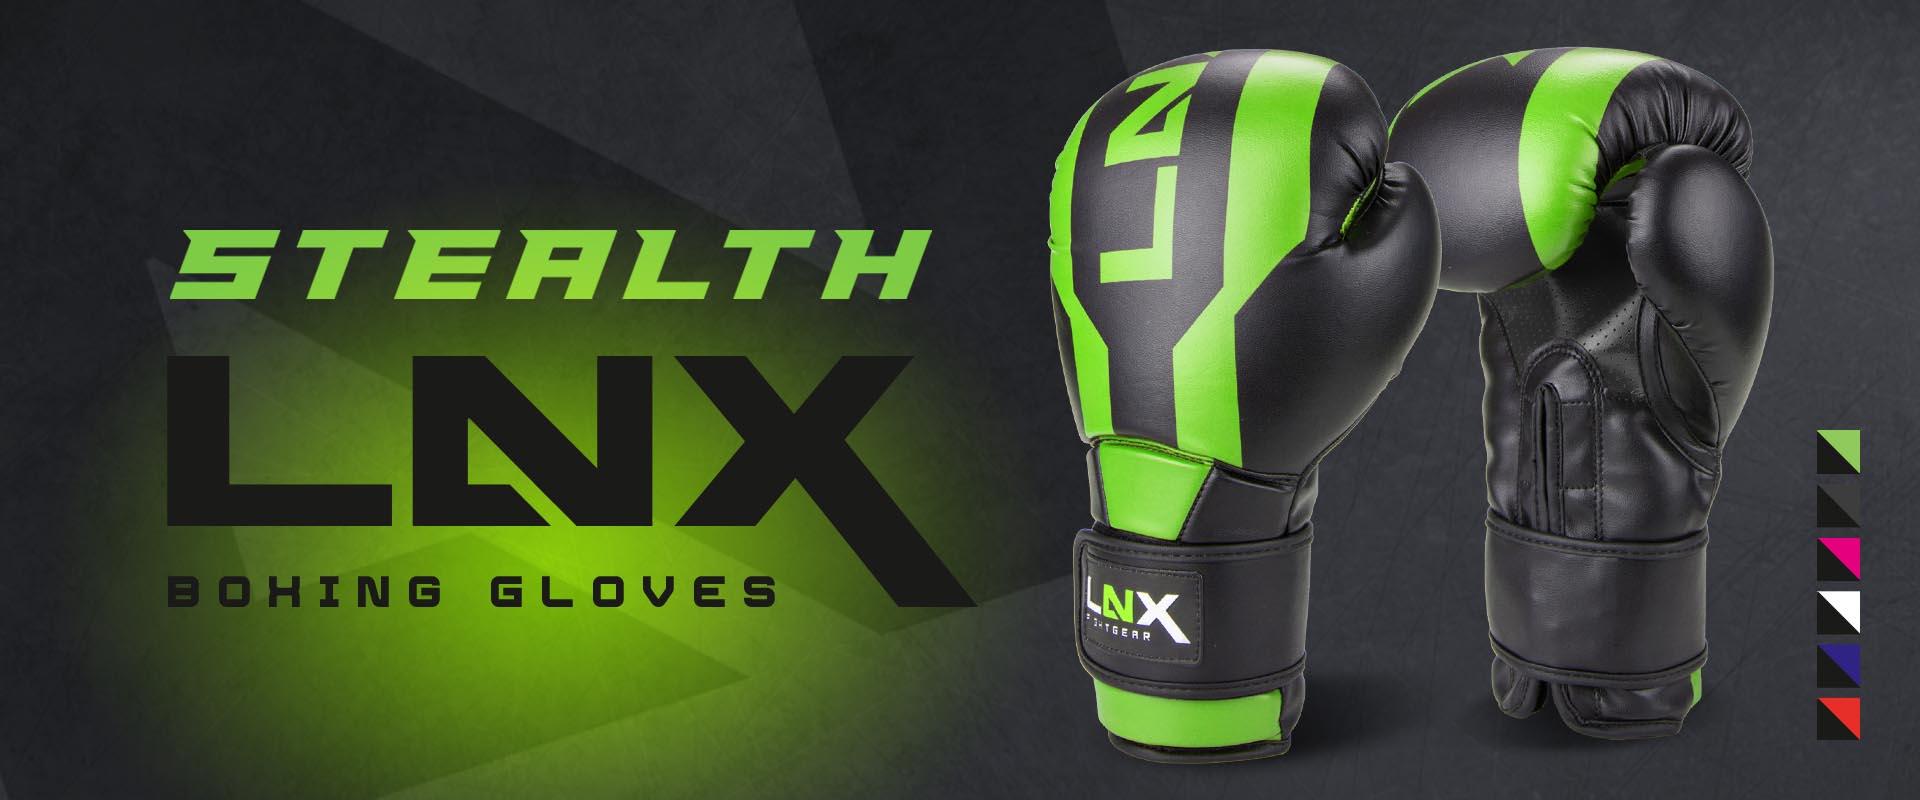 LNX Boxhandschuhe Stealth